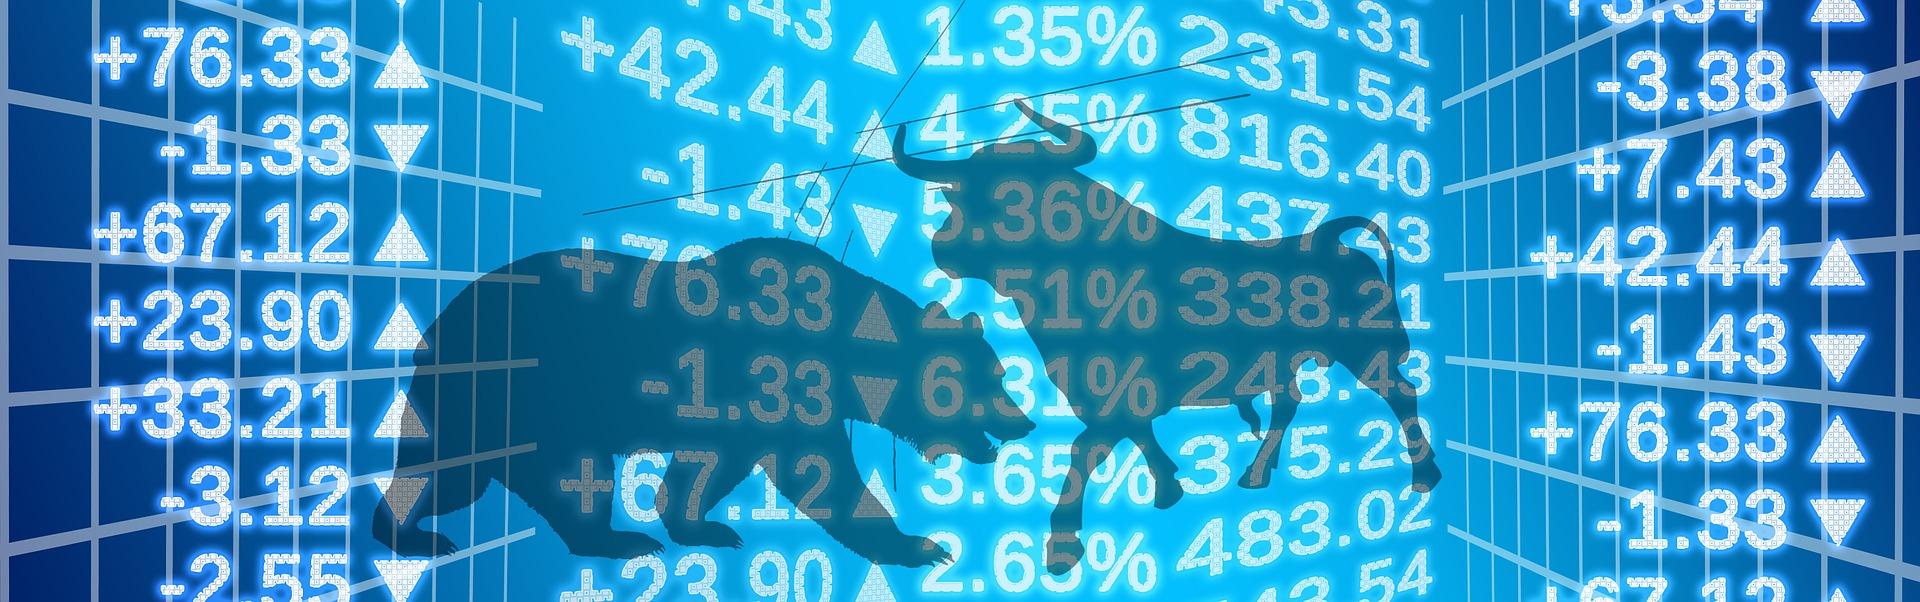 stock-exchange-913982_1920.jpg